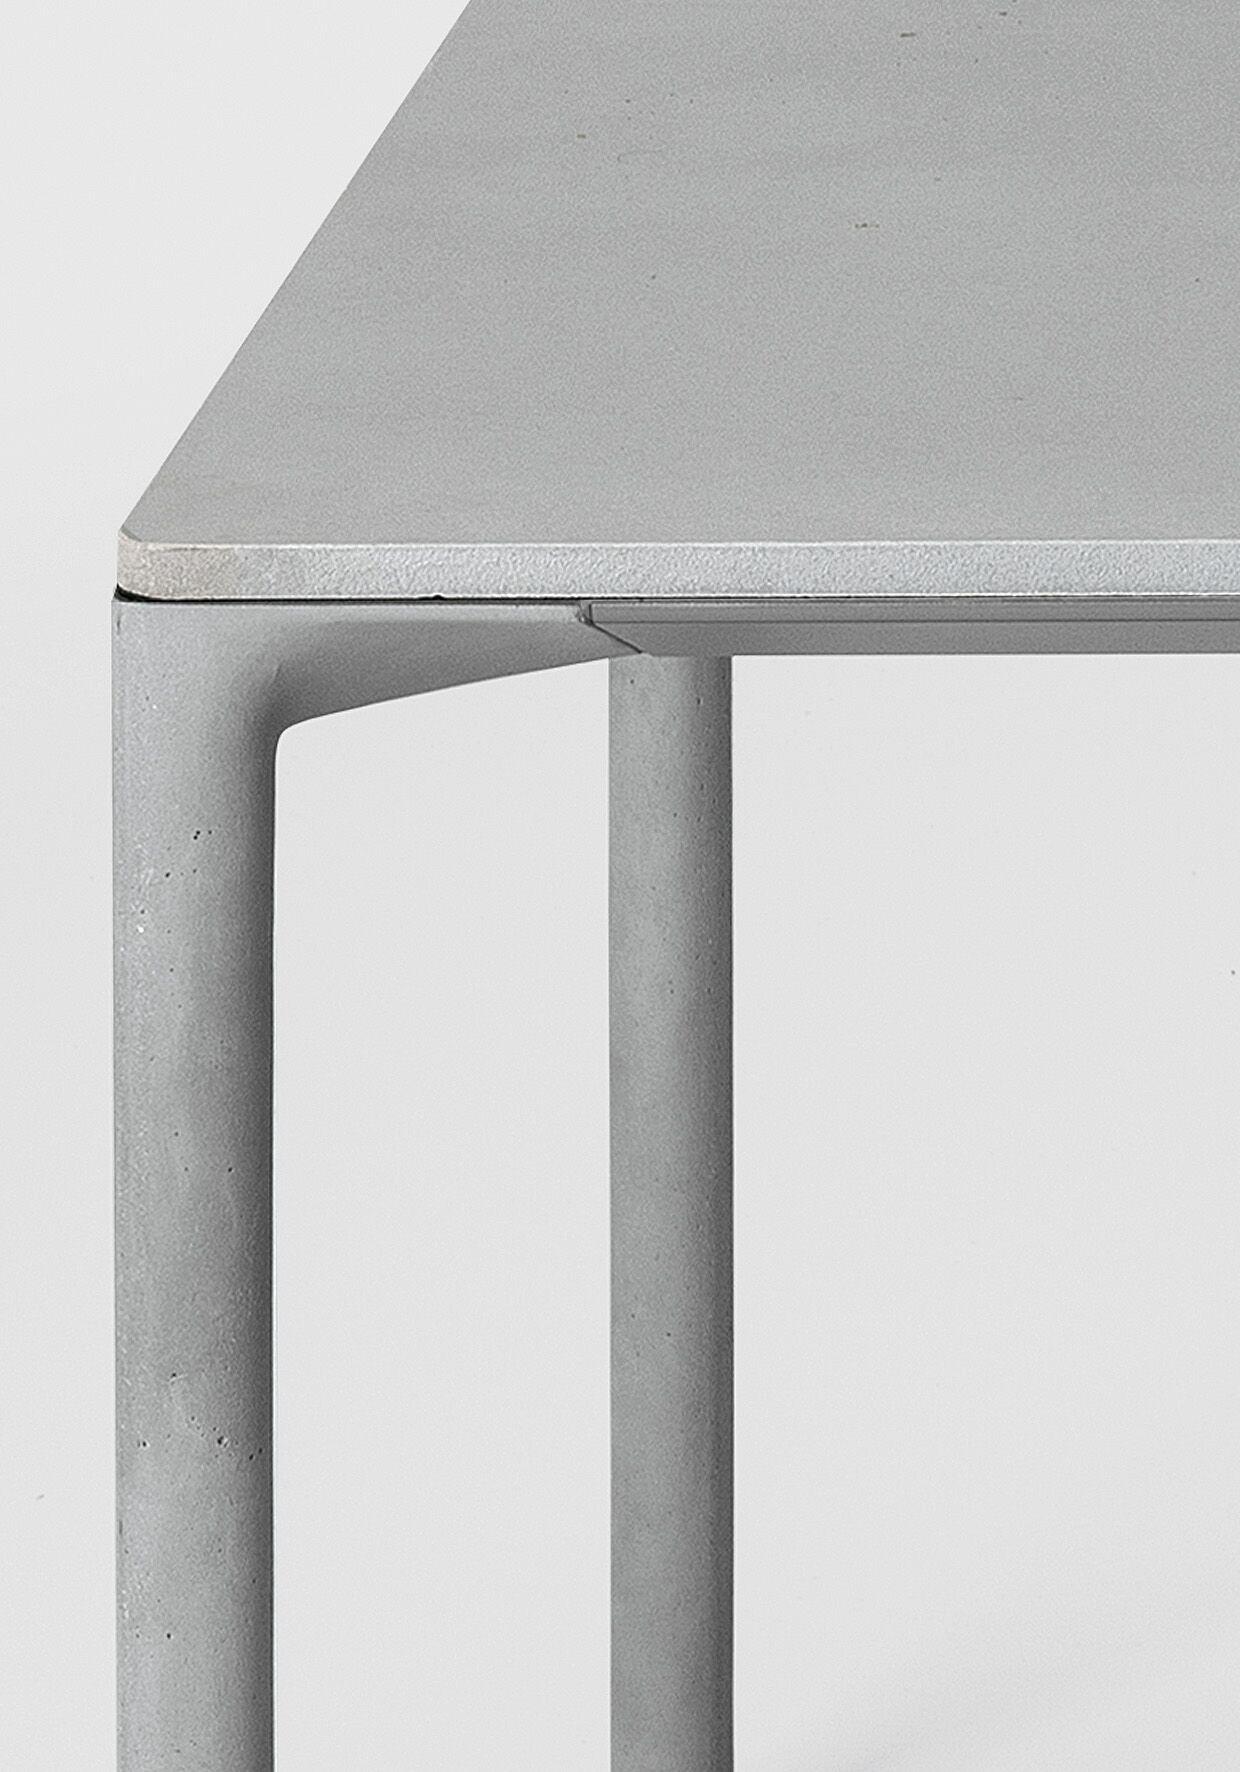 Boiacca Table In Cement Or Fenix Ntm Or Pure White Laminate Eettafel Ontwerp Eettafel Ontwerp [ 1772 x 1240 Pixel ]